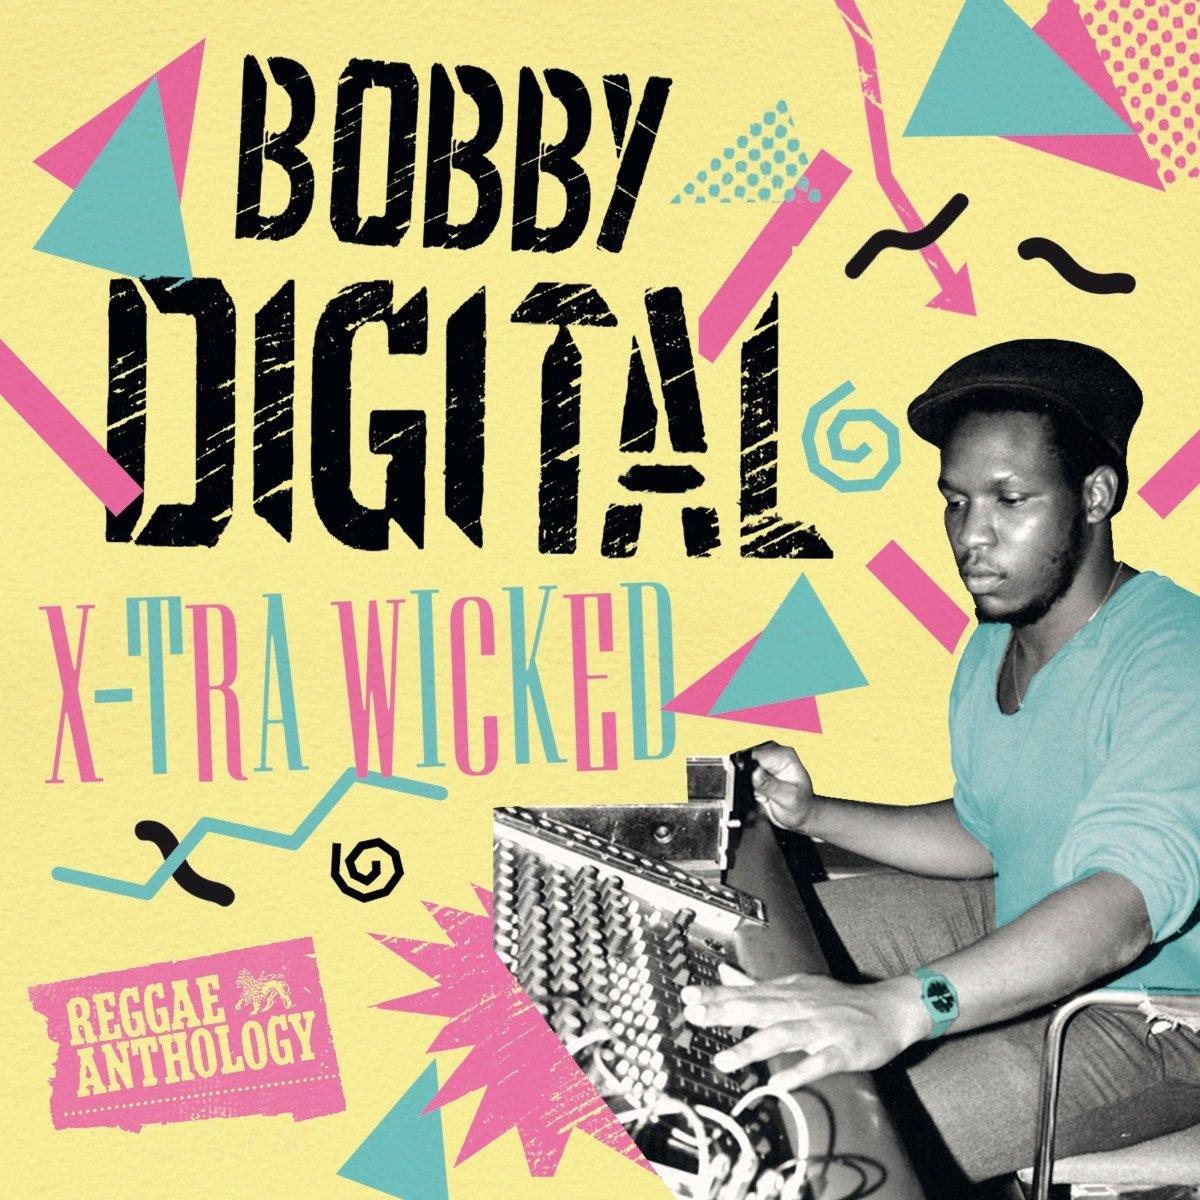 X-Tra online shop Max 61% OFF Wicked Bobby Reggae Digital Anthology